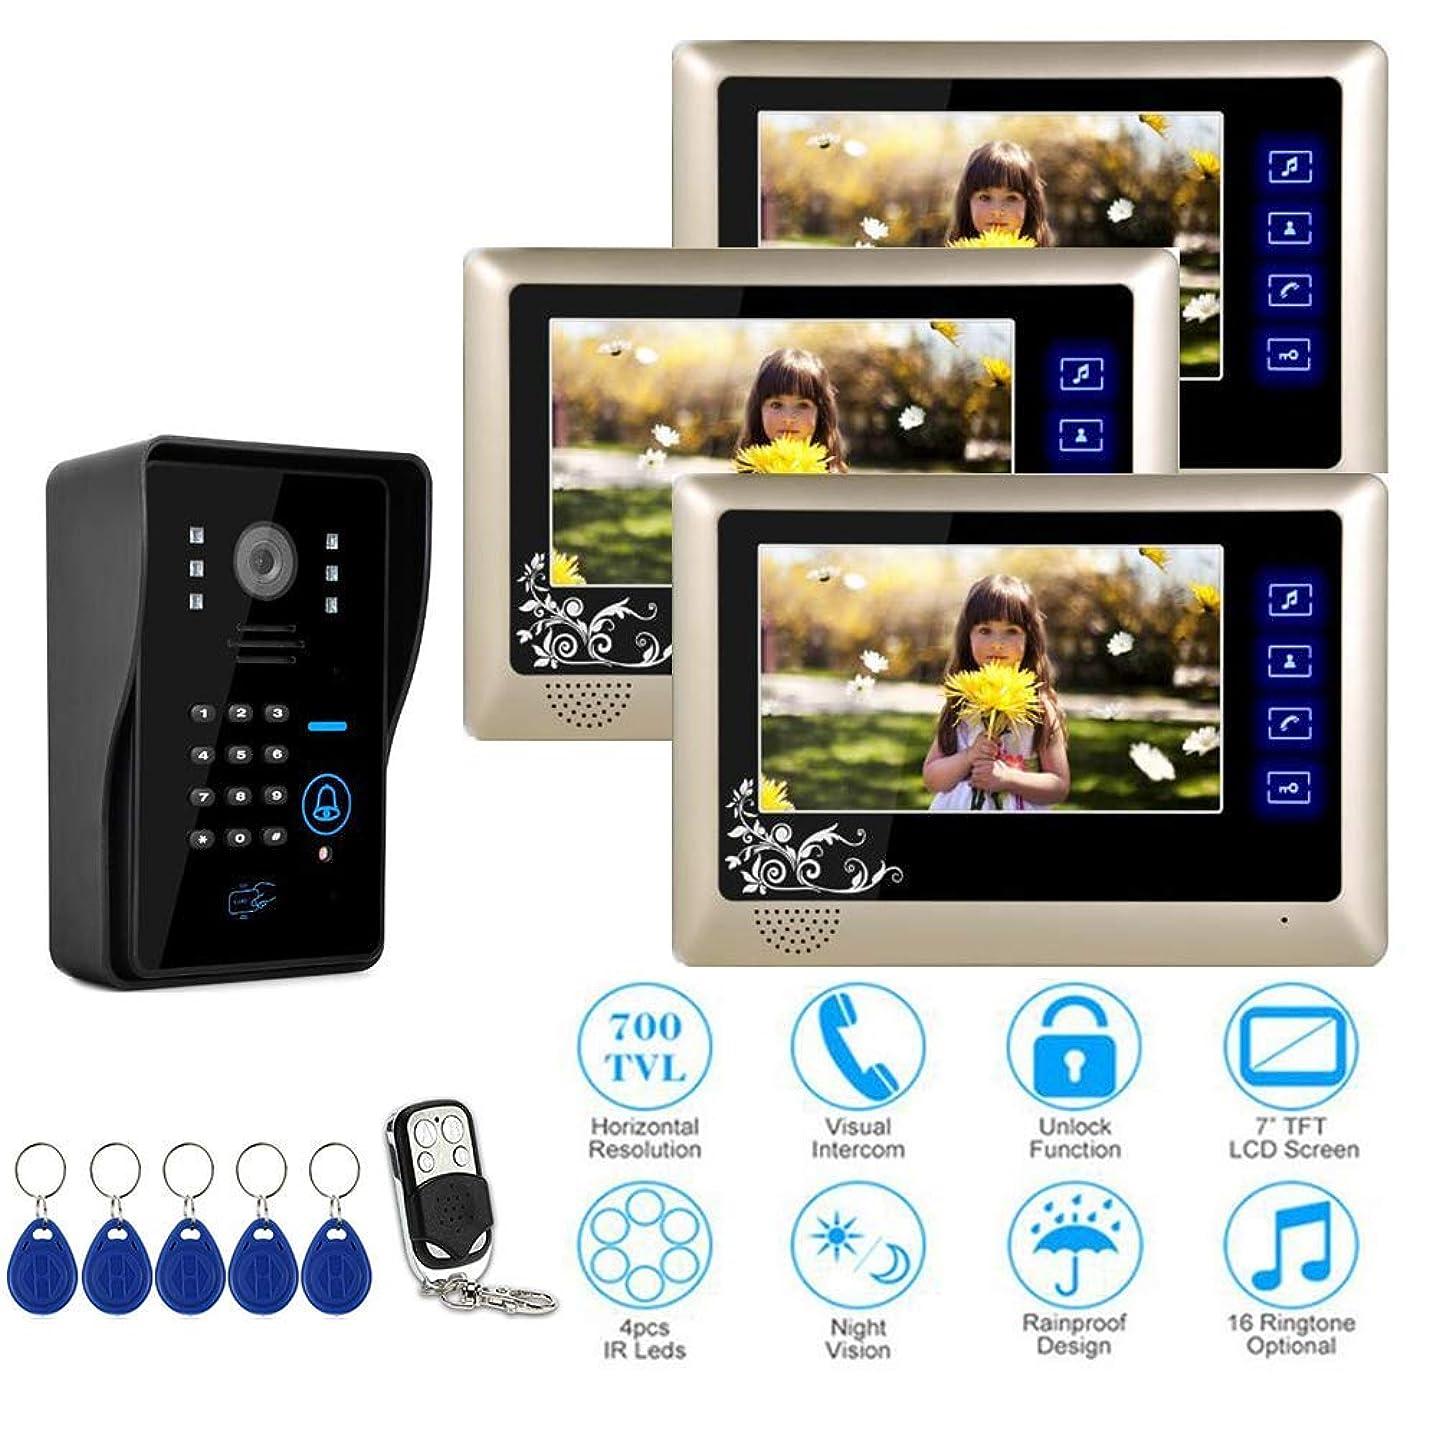 JINPENGPEN 7-Inch Smart Video Doorbell Remote Intercom Access Control System HD Infrared Camera,1/3